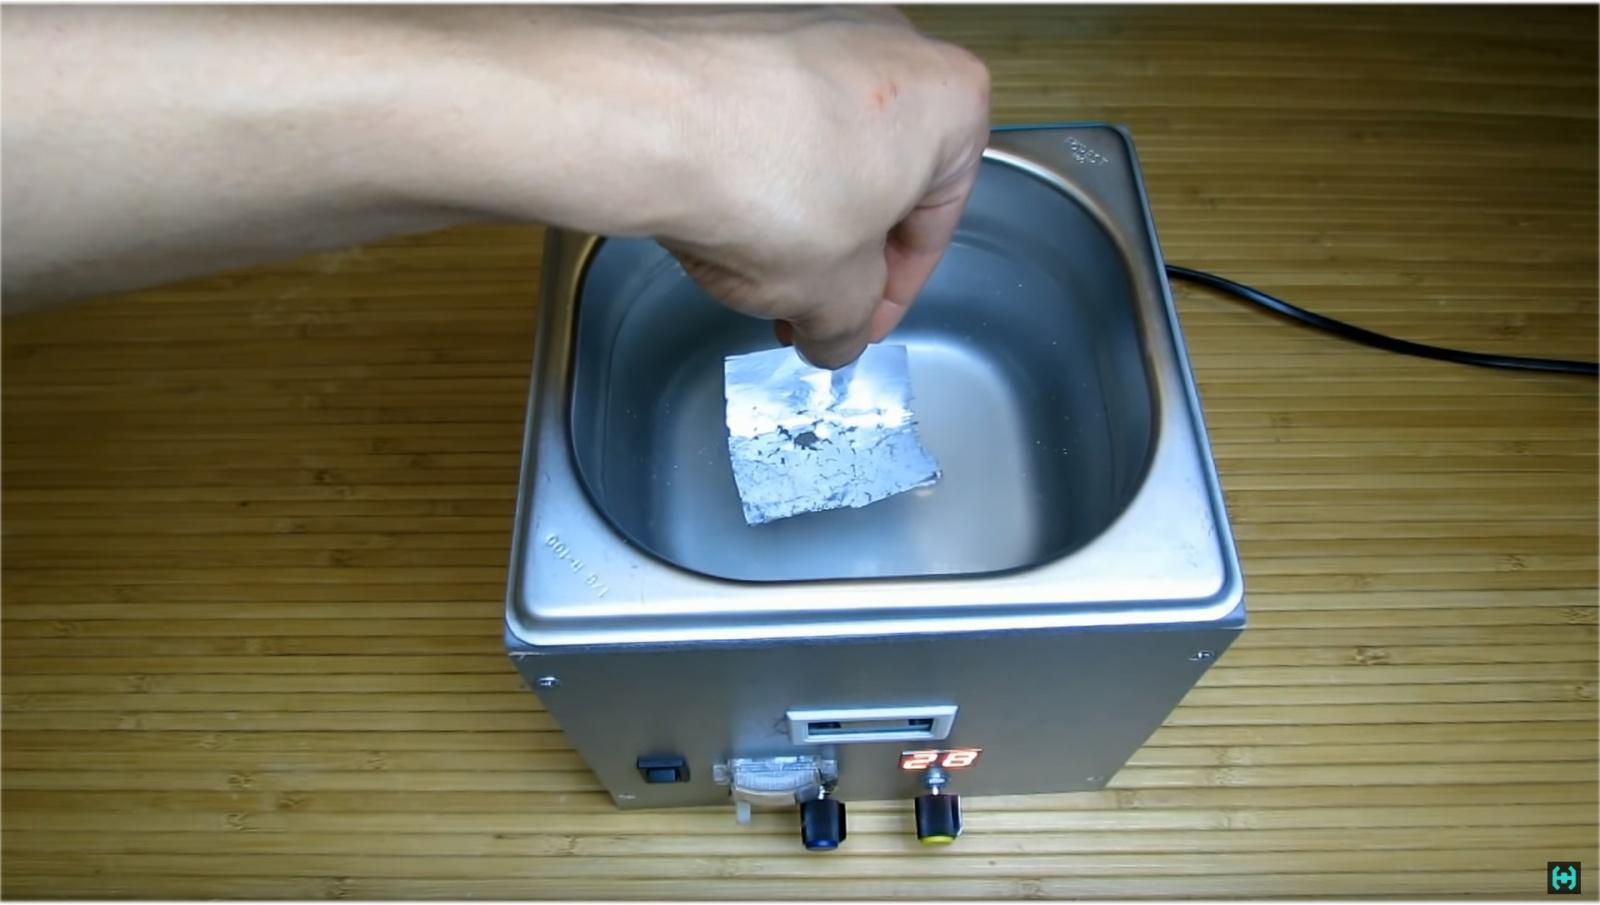 Ультразвуковая ванна. Часть 2 - 3